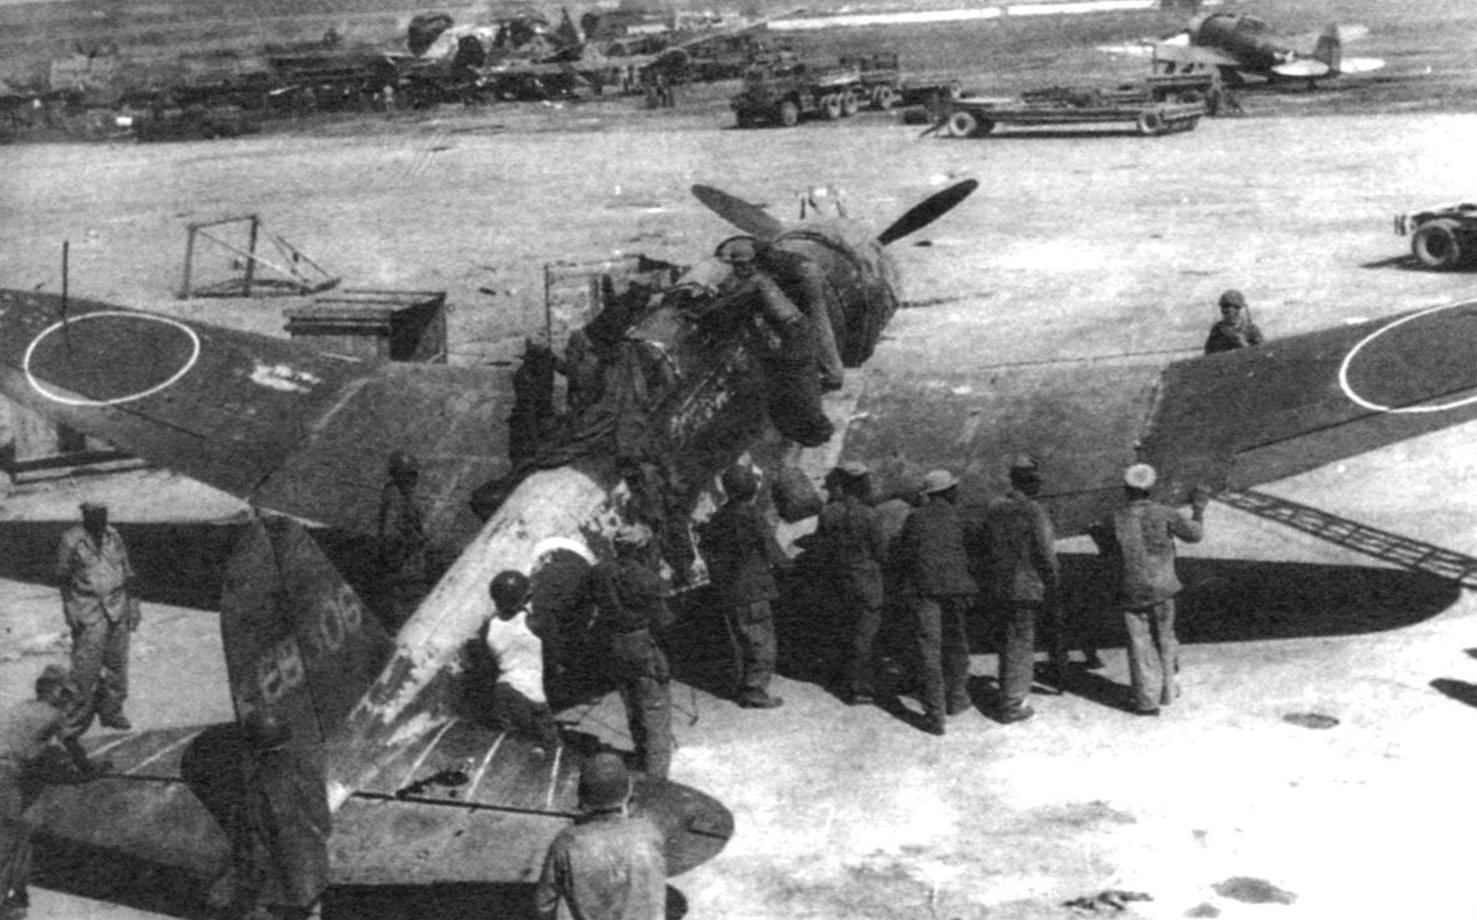 Трофейный патрульный Nakajima B5N2 Model 12 «Kate» с РЛС Н-6. Сайпан, 1944 г.